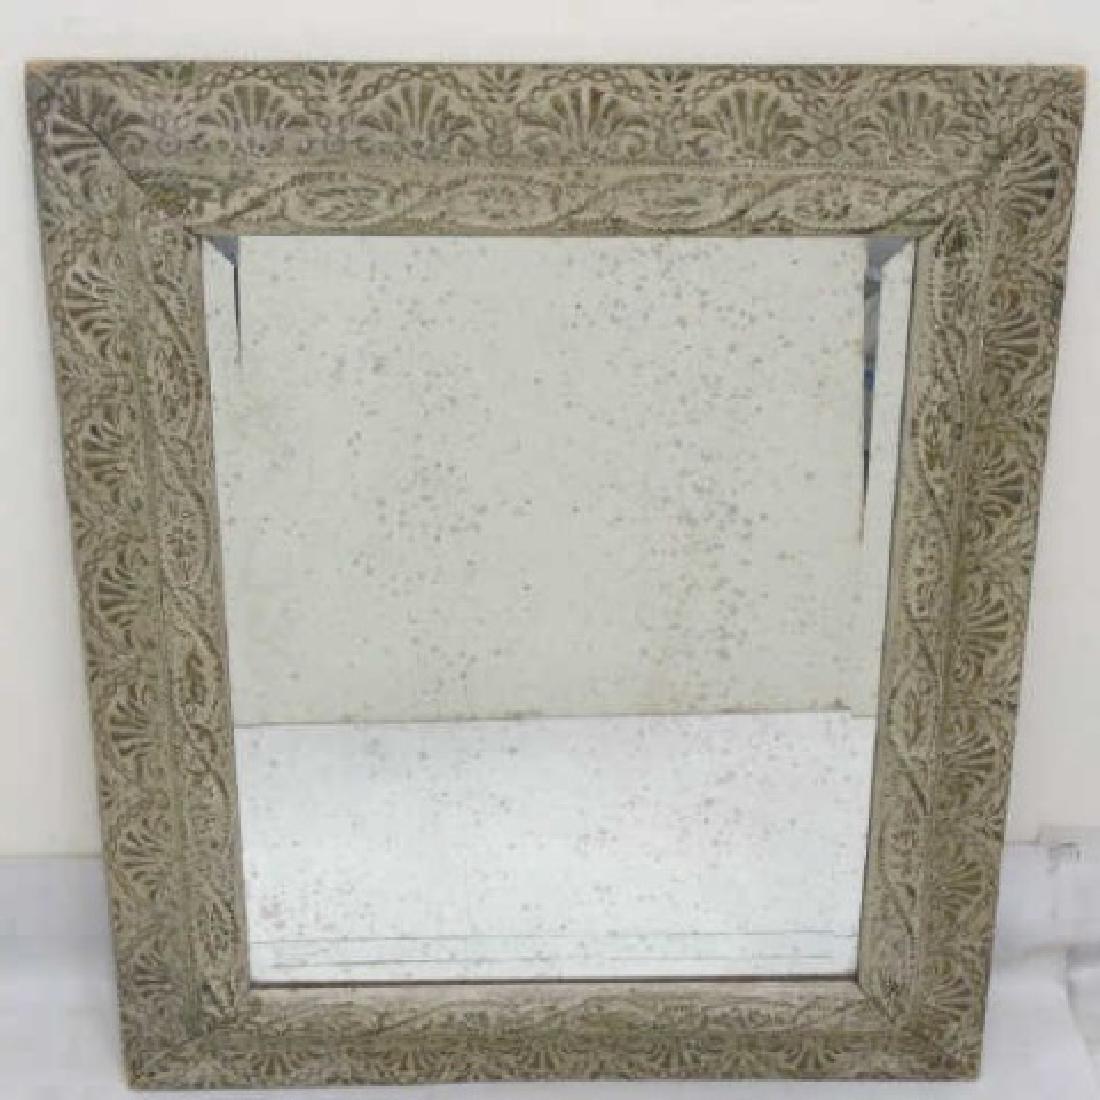 Antique Style Framed Rectangular Mirror